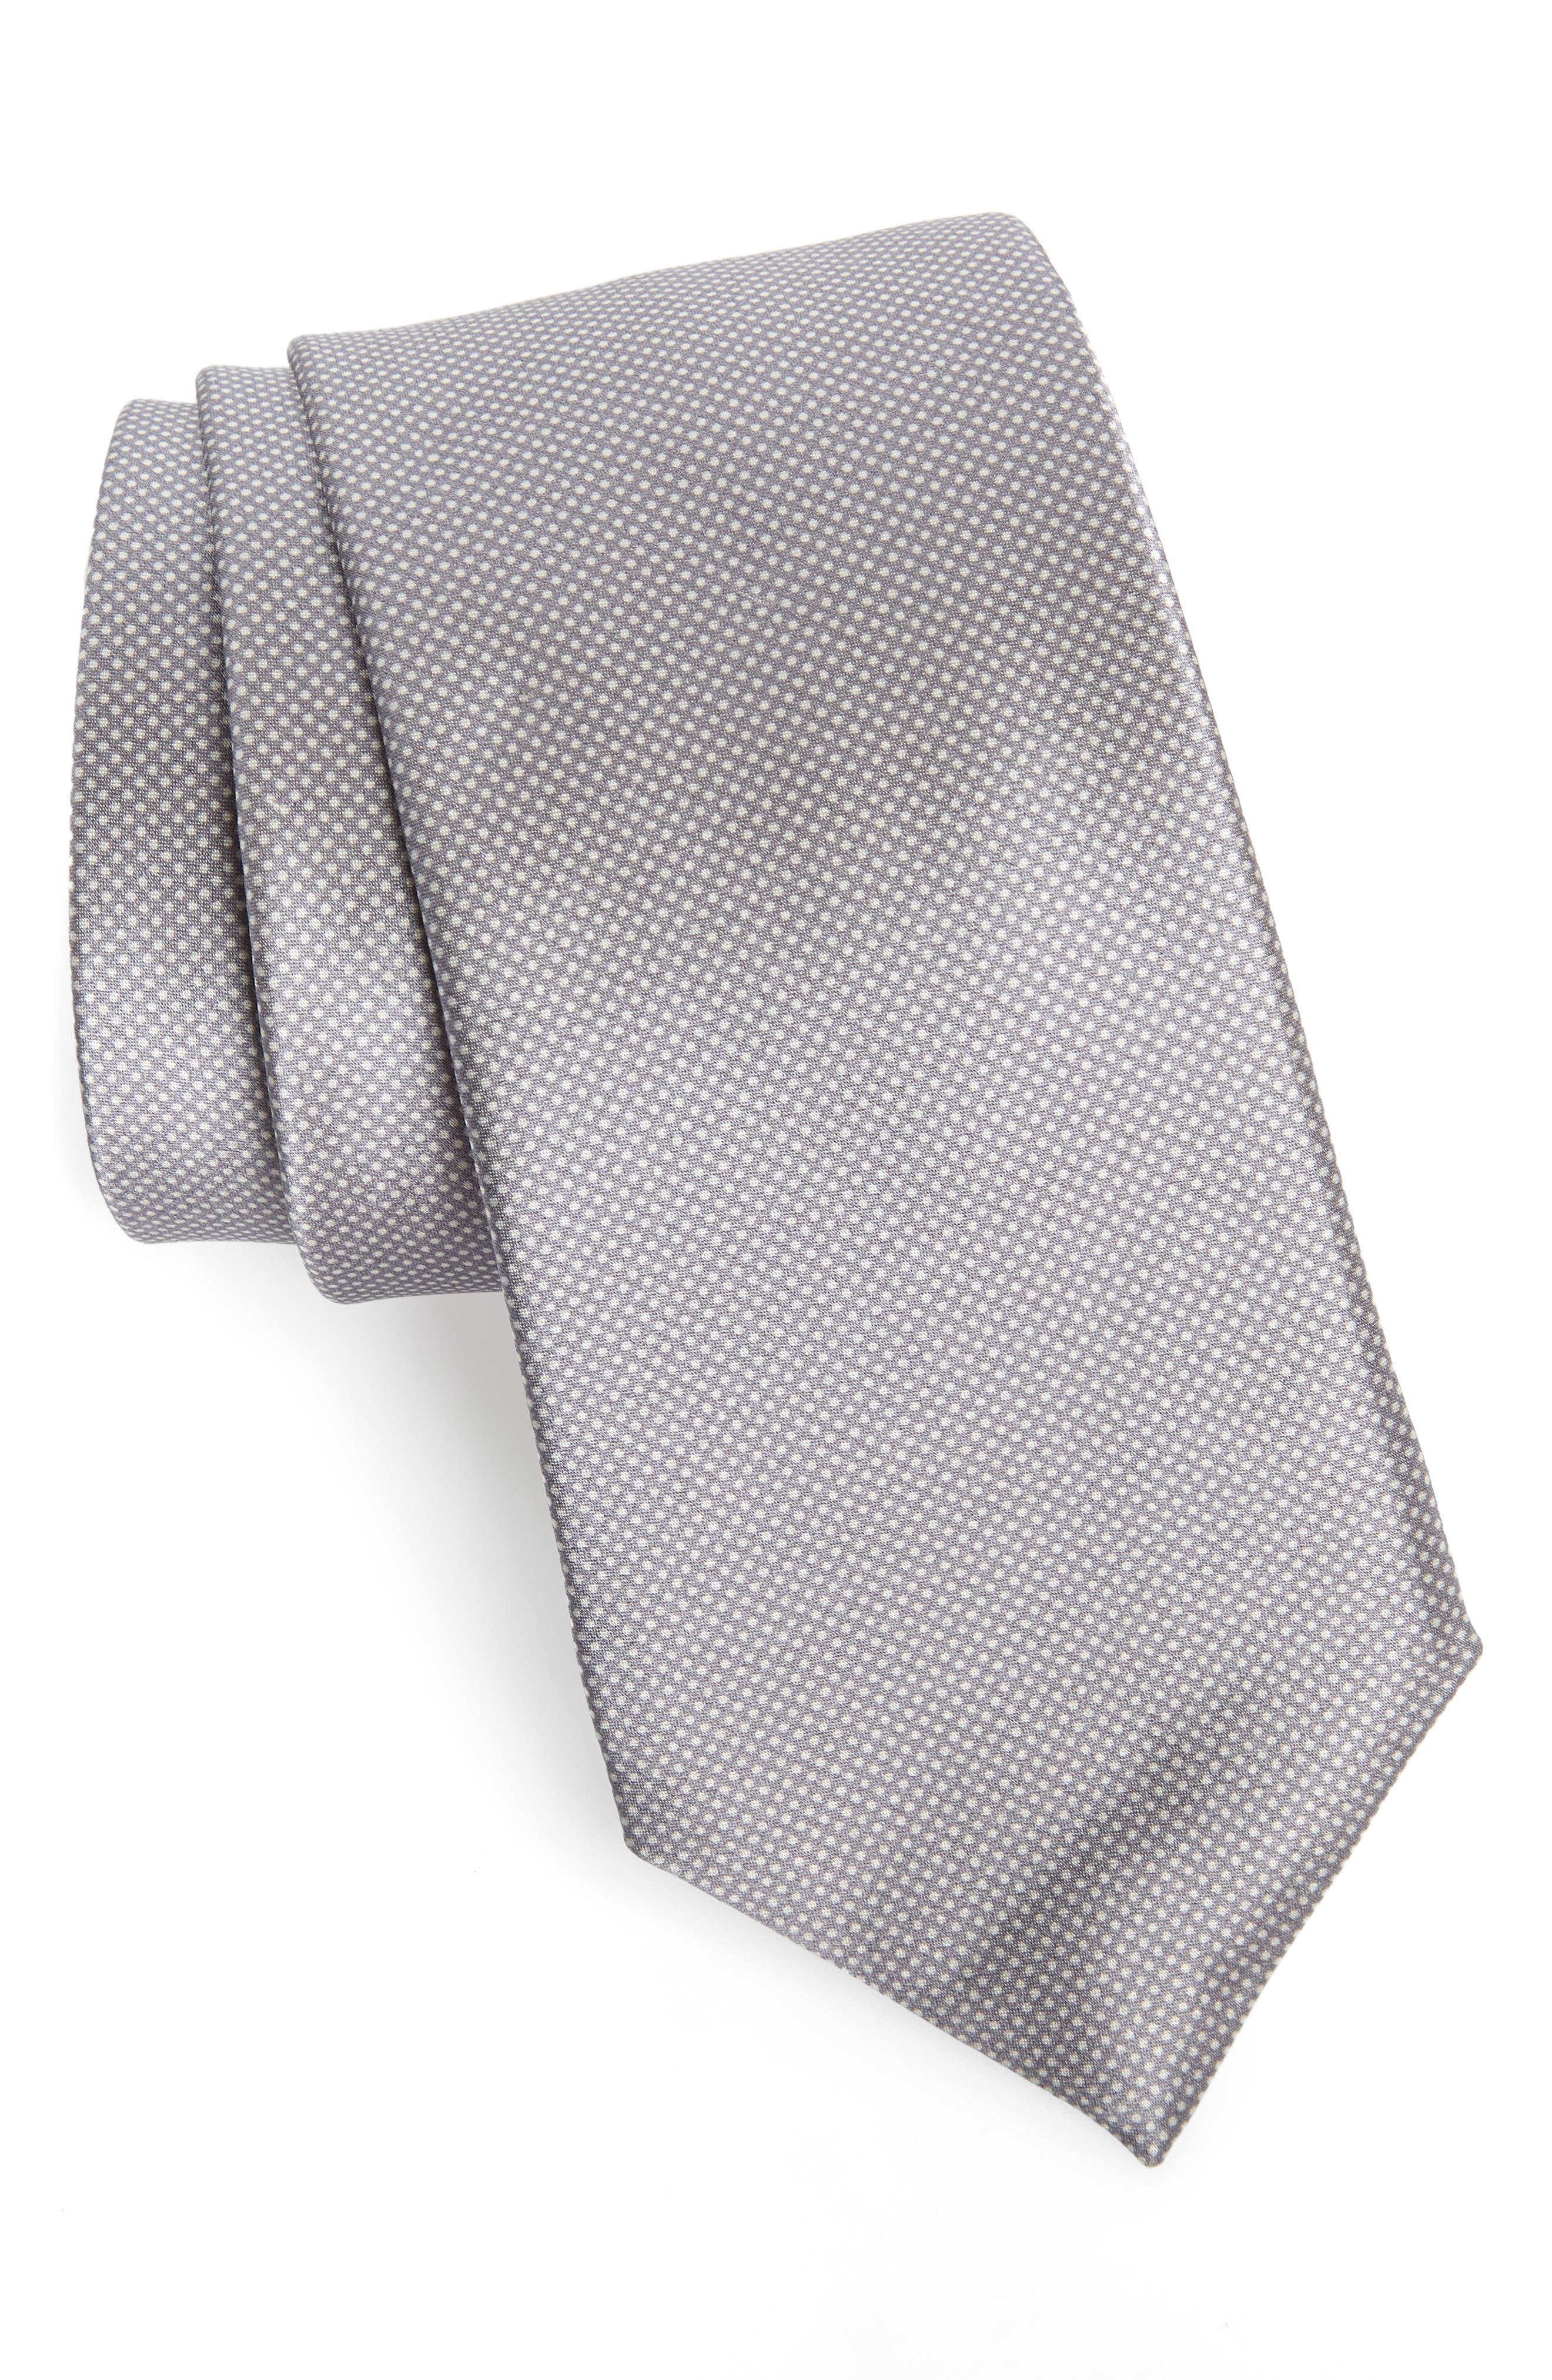 Spots Silk Tie,                             Main thumbnail 1, color,                             SILVER